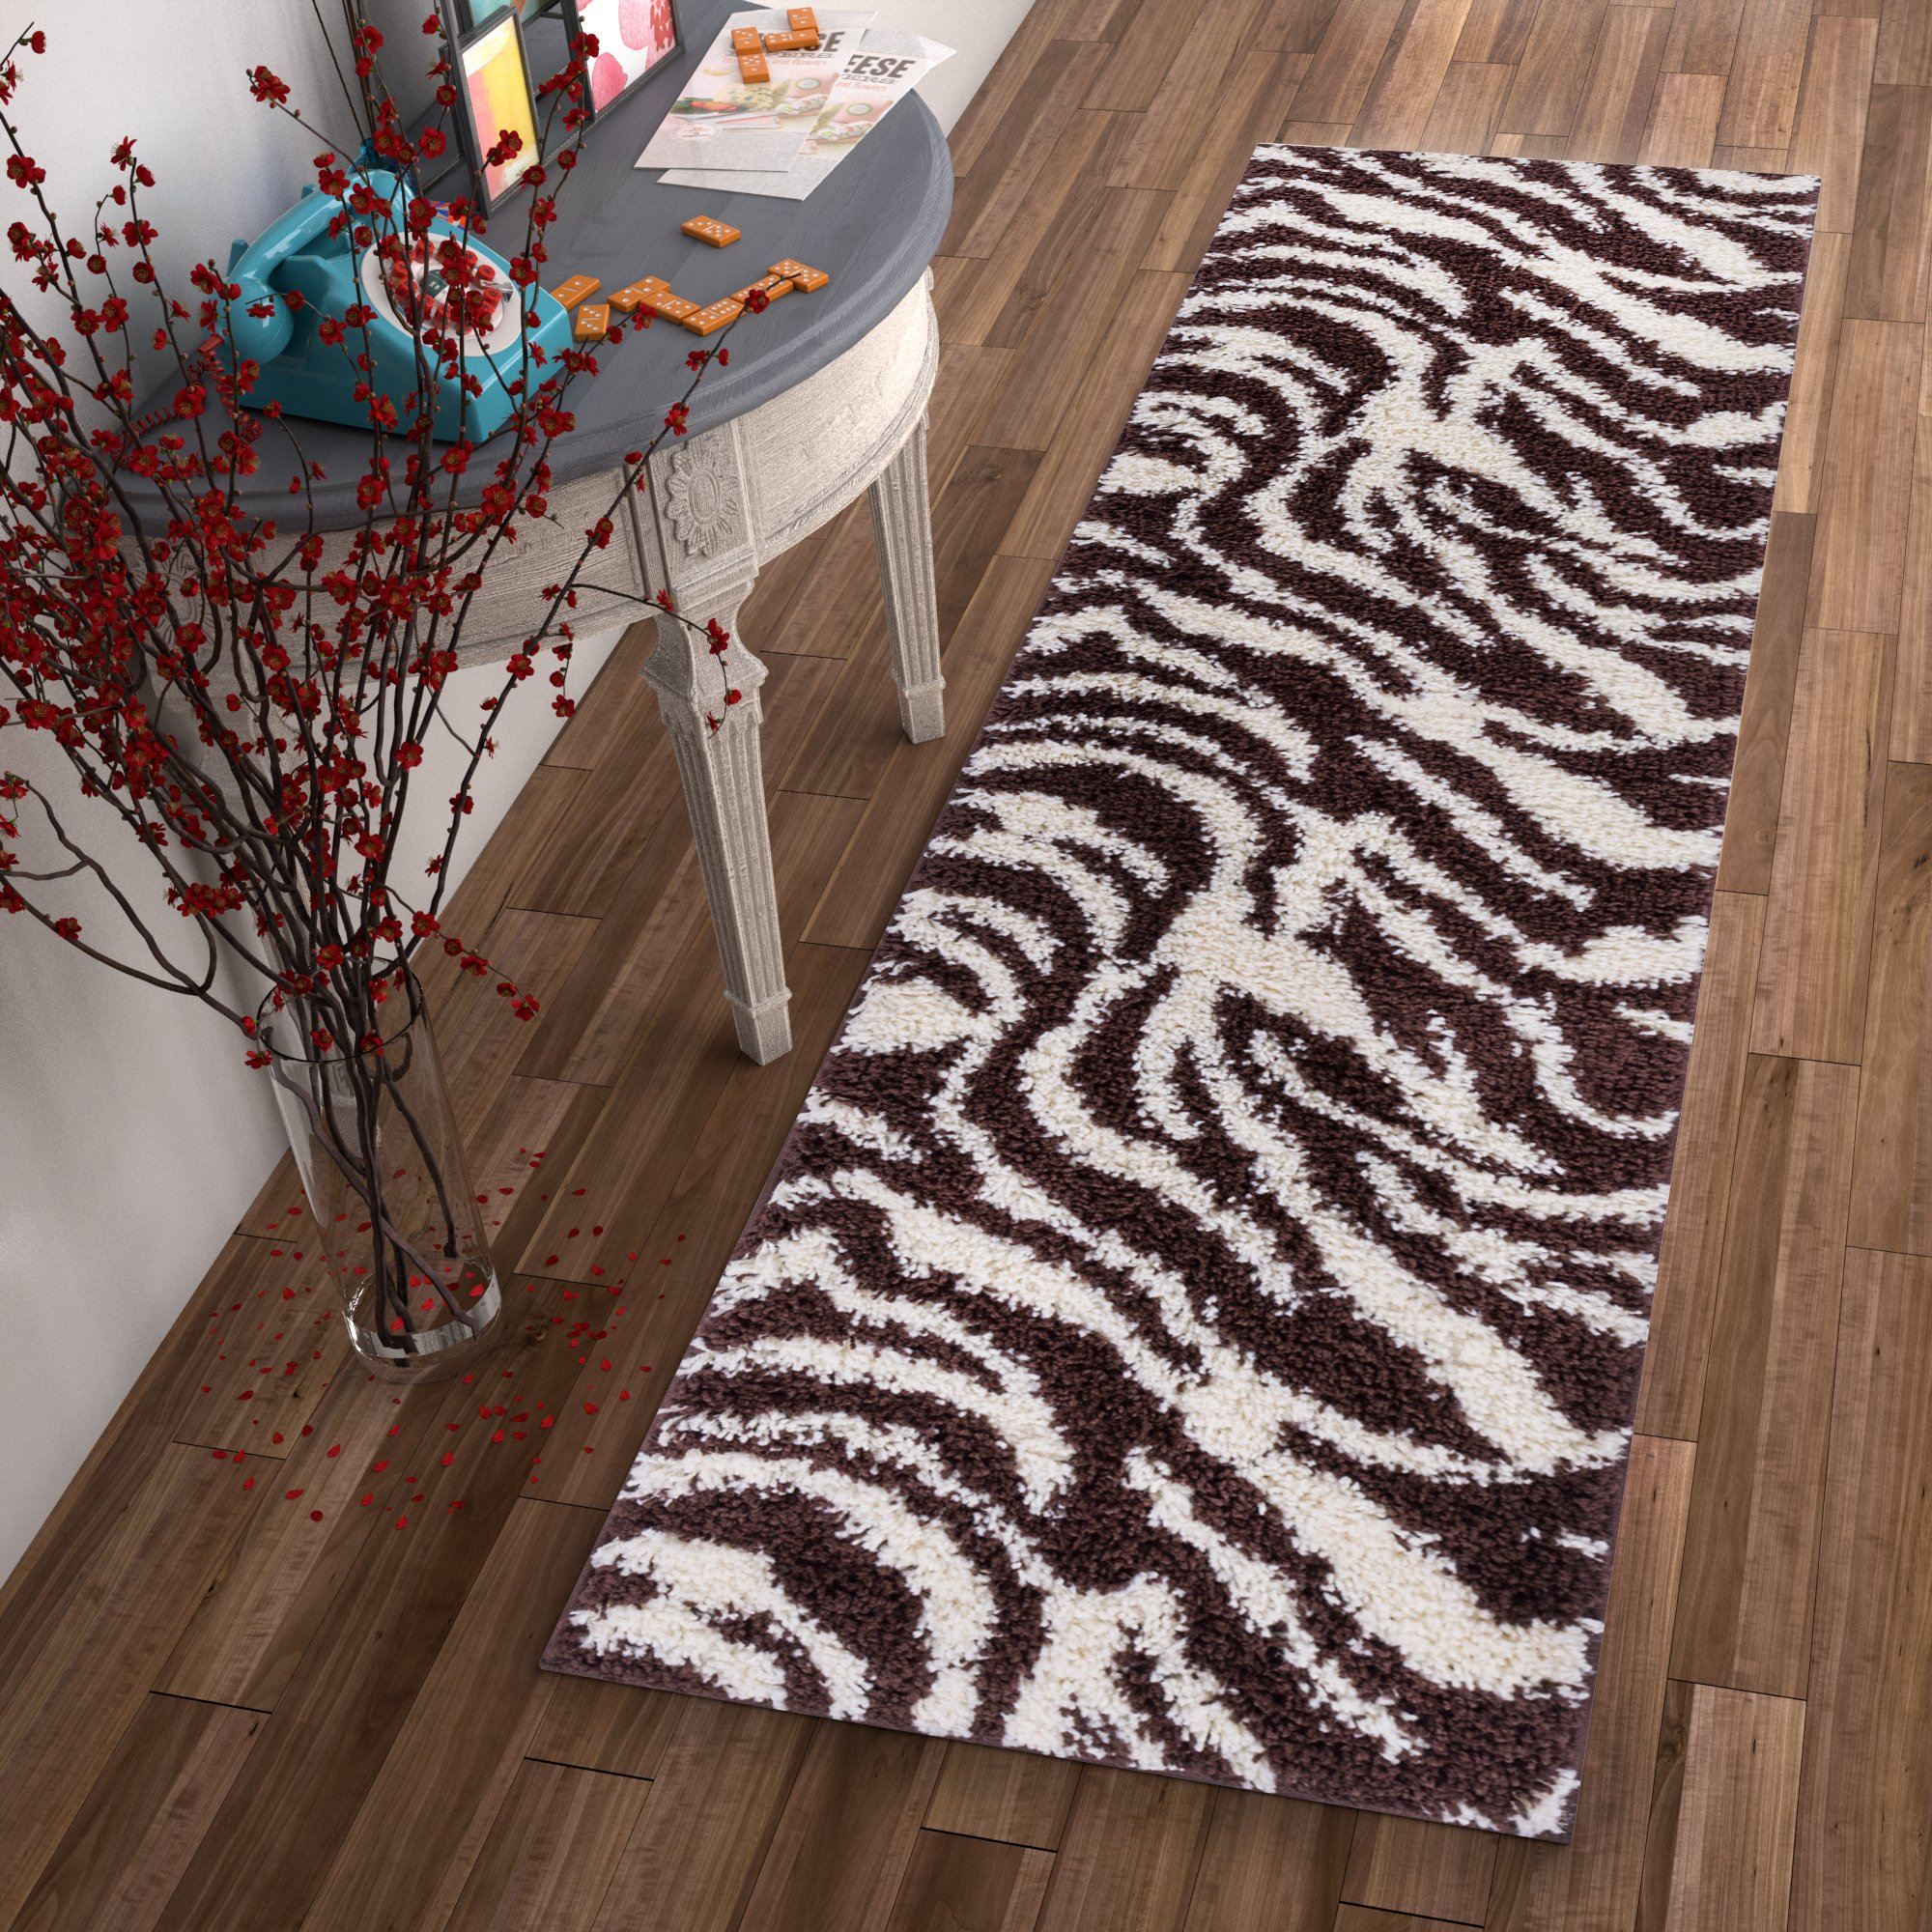 Modern Animal Print 2x7 ( 2'' x 7'3'' Runner ) Area Rug Shag Zebra Brown Ivory Plush Easy Care Thick Soft Plush Living Room